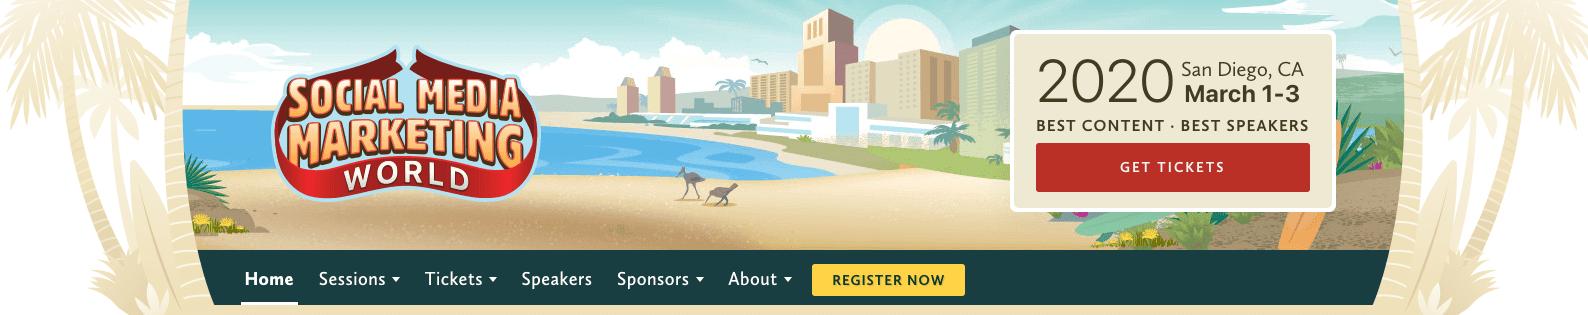 event-branding-SME-2020-event-header-image-min